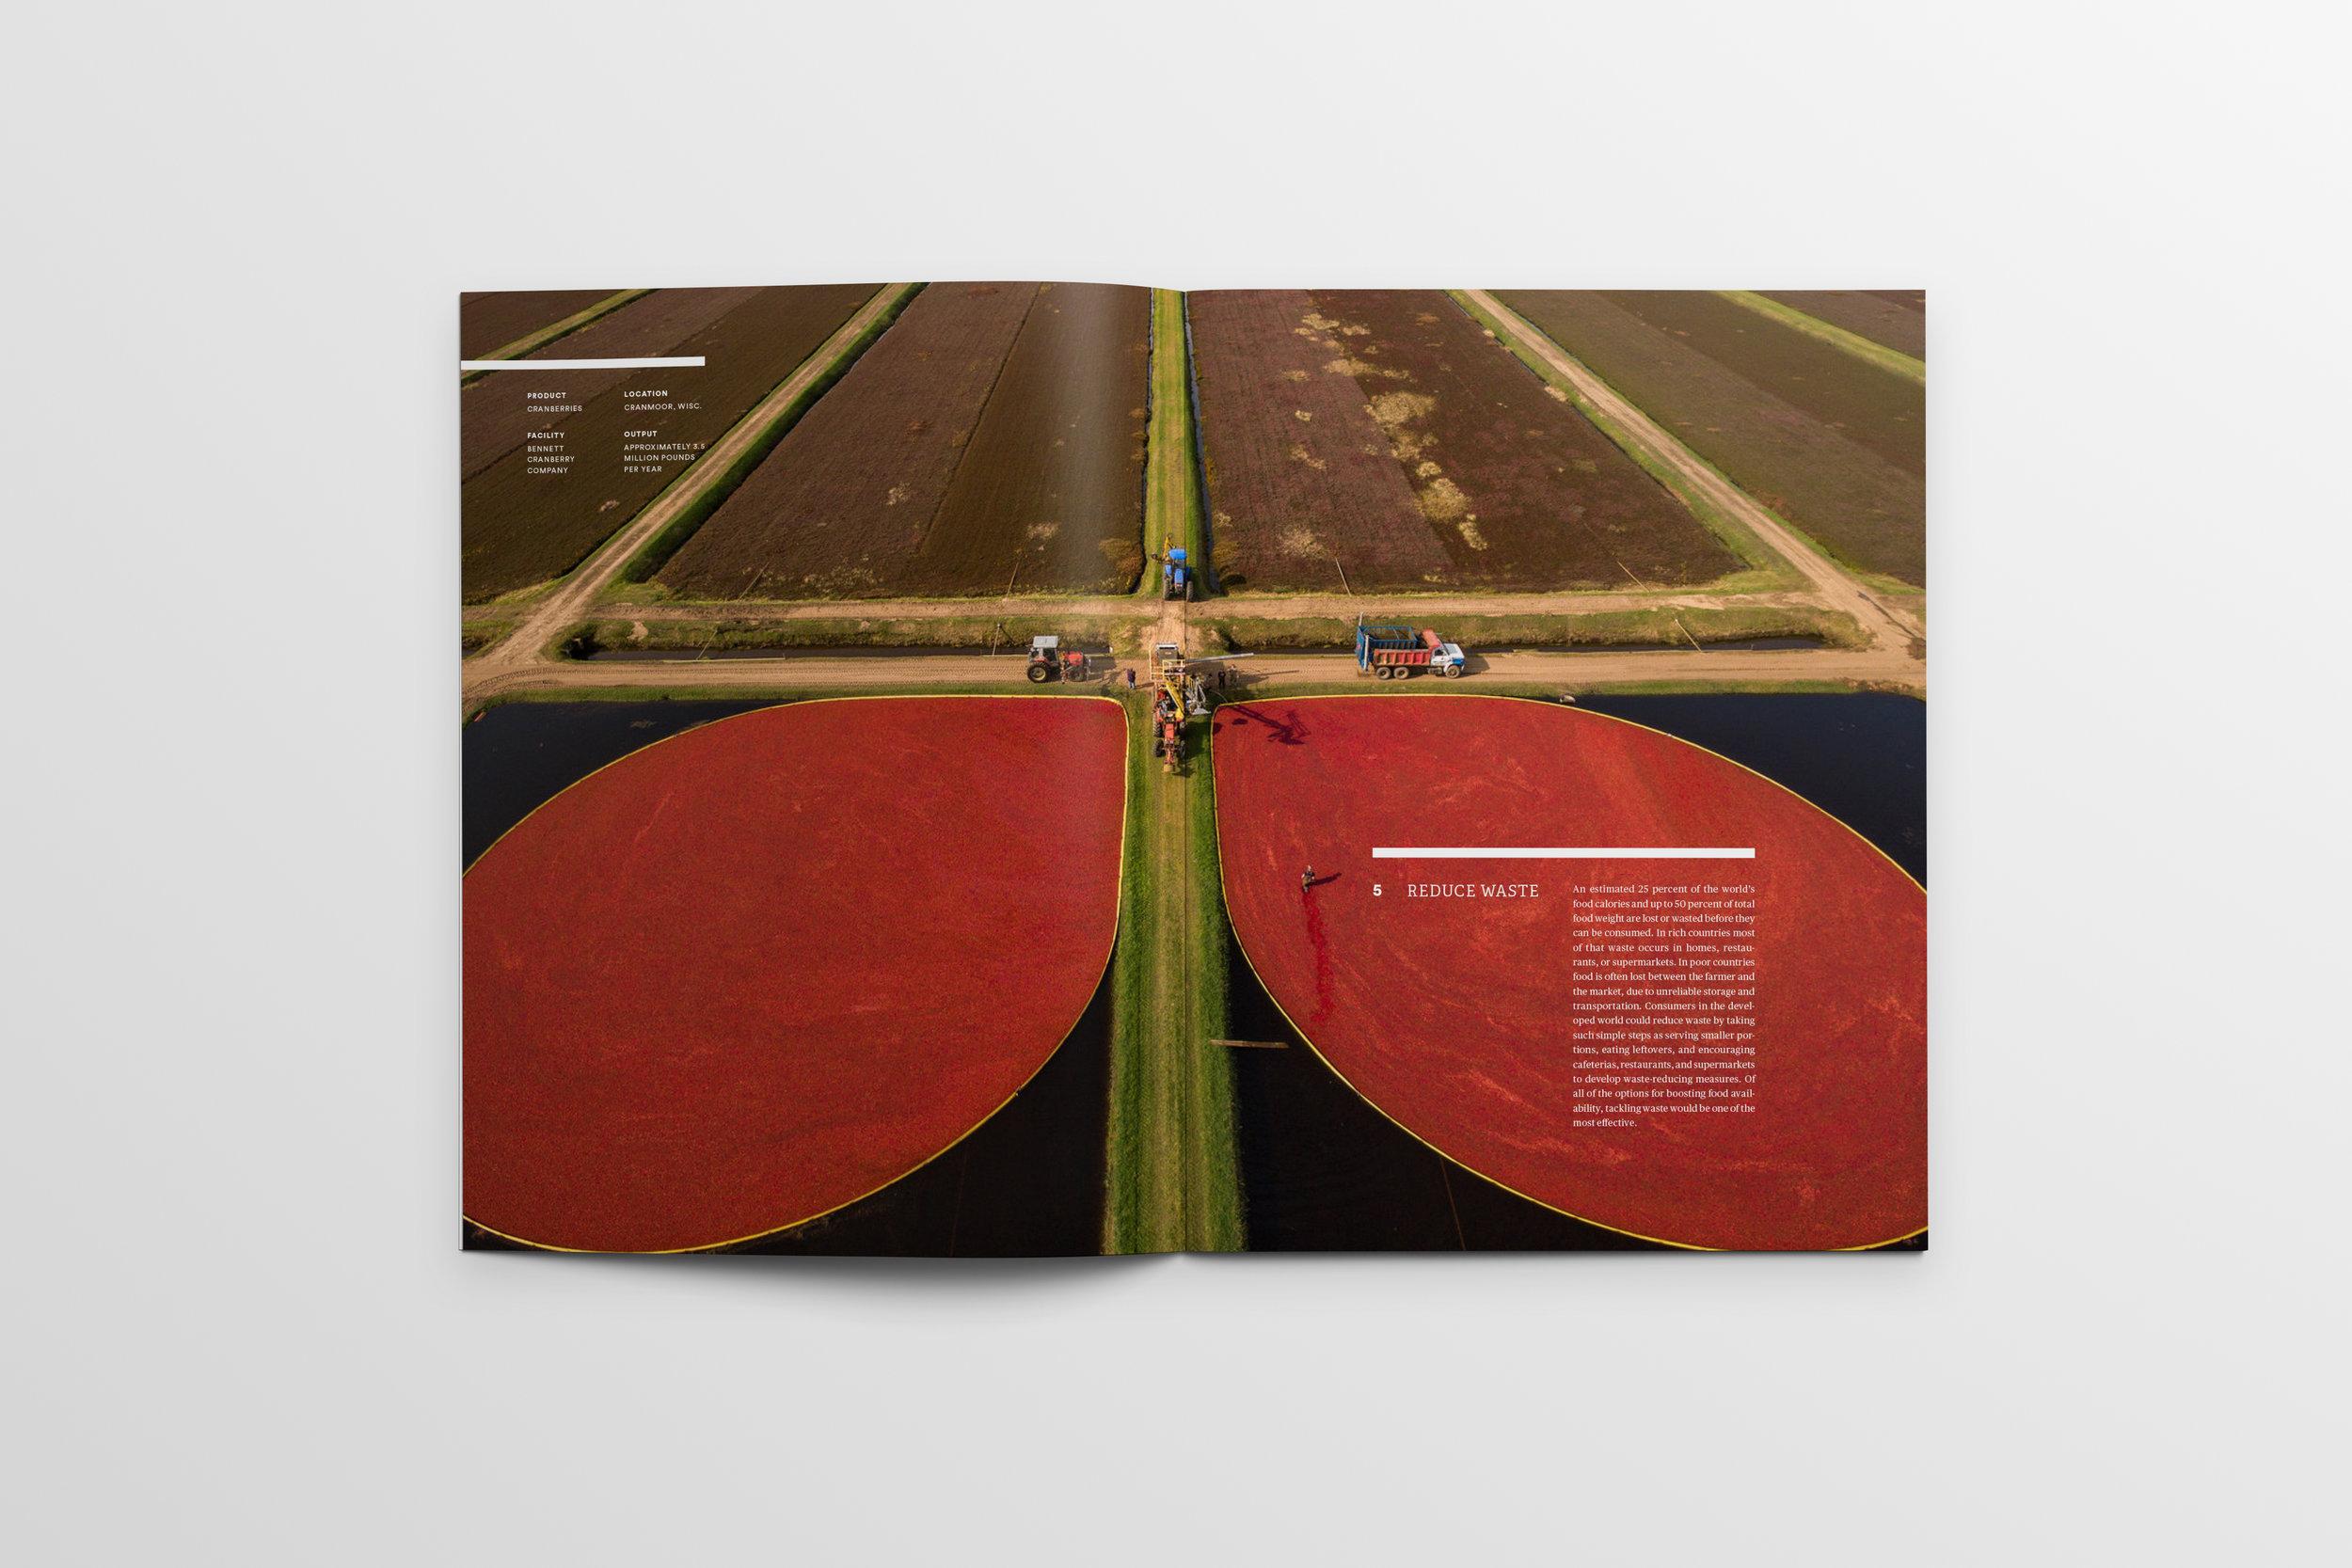 Magazine_Mockup_Pages40-41.jpg